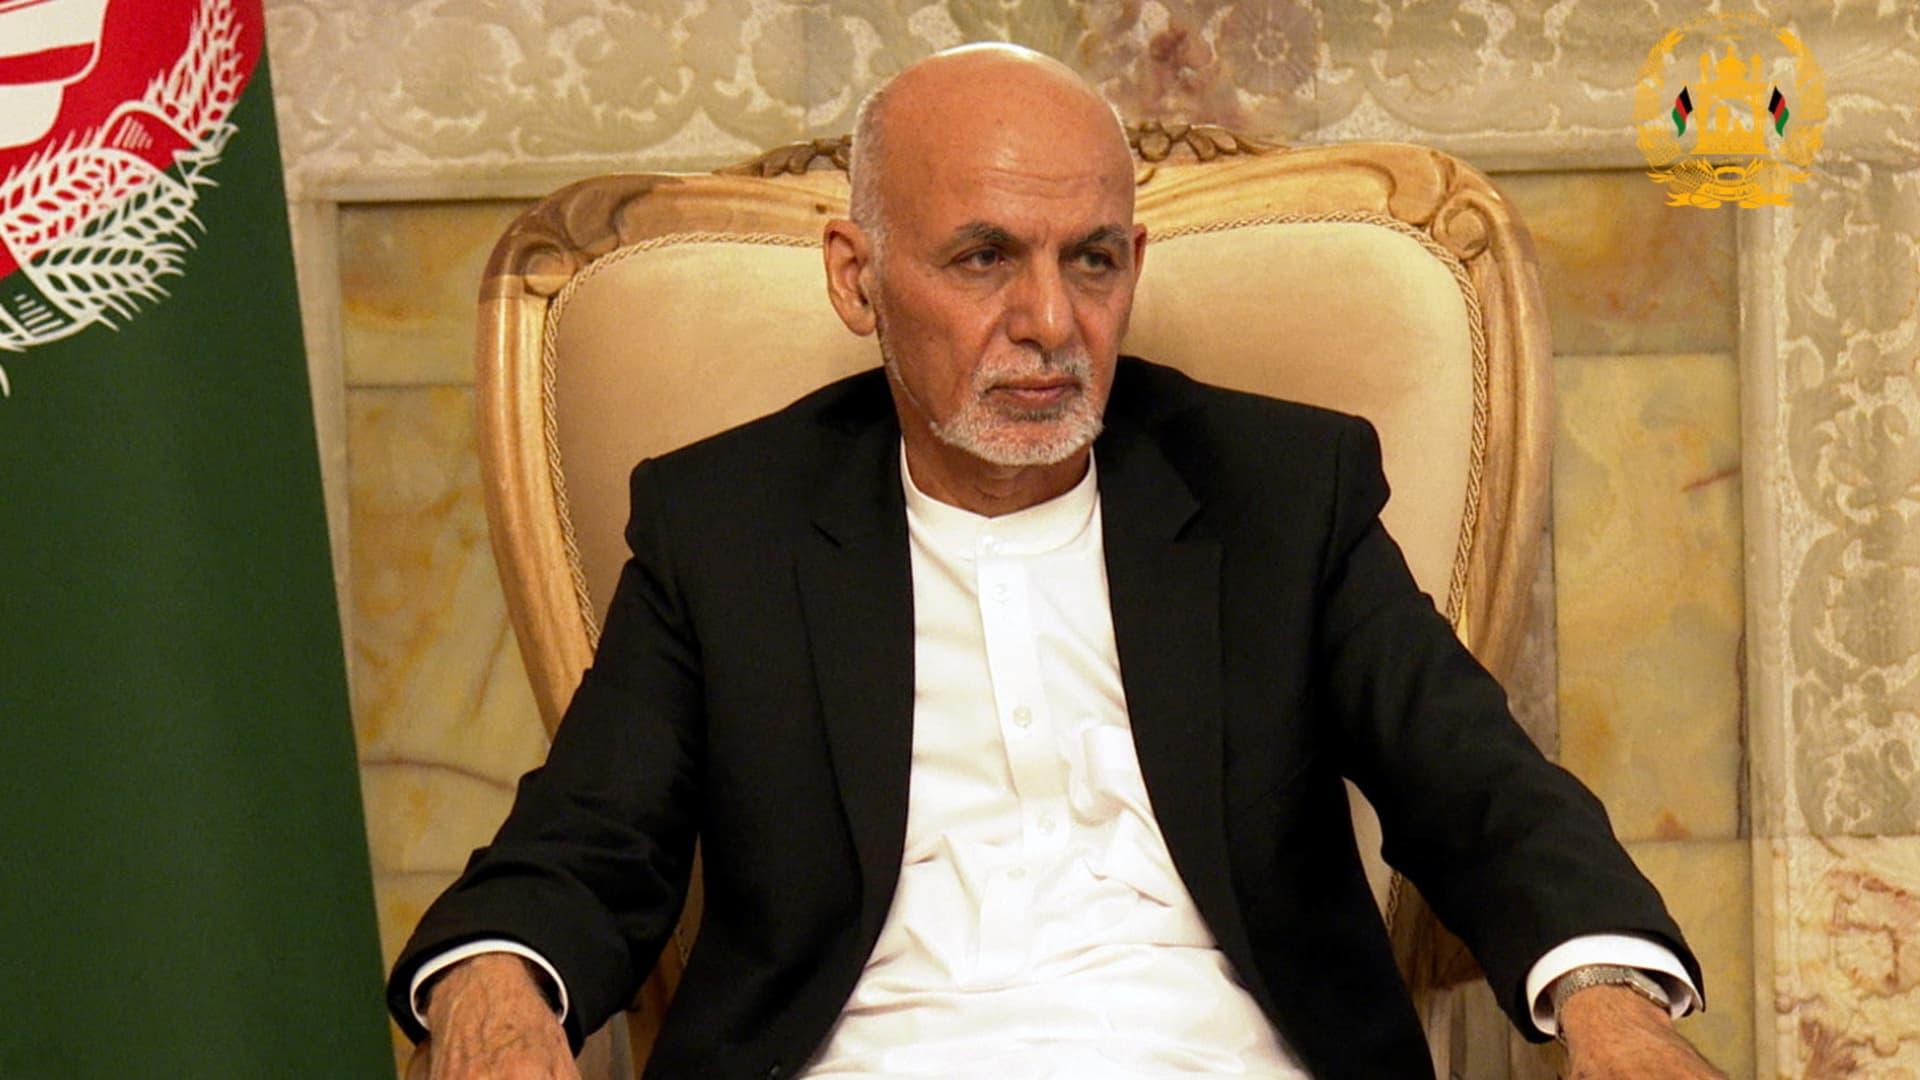 Afghanistan's President Ashraf Ghani attends a security meeting in Kabul, Afghanistan August 14, 2021.